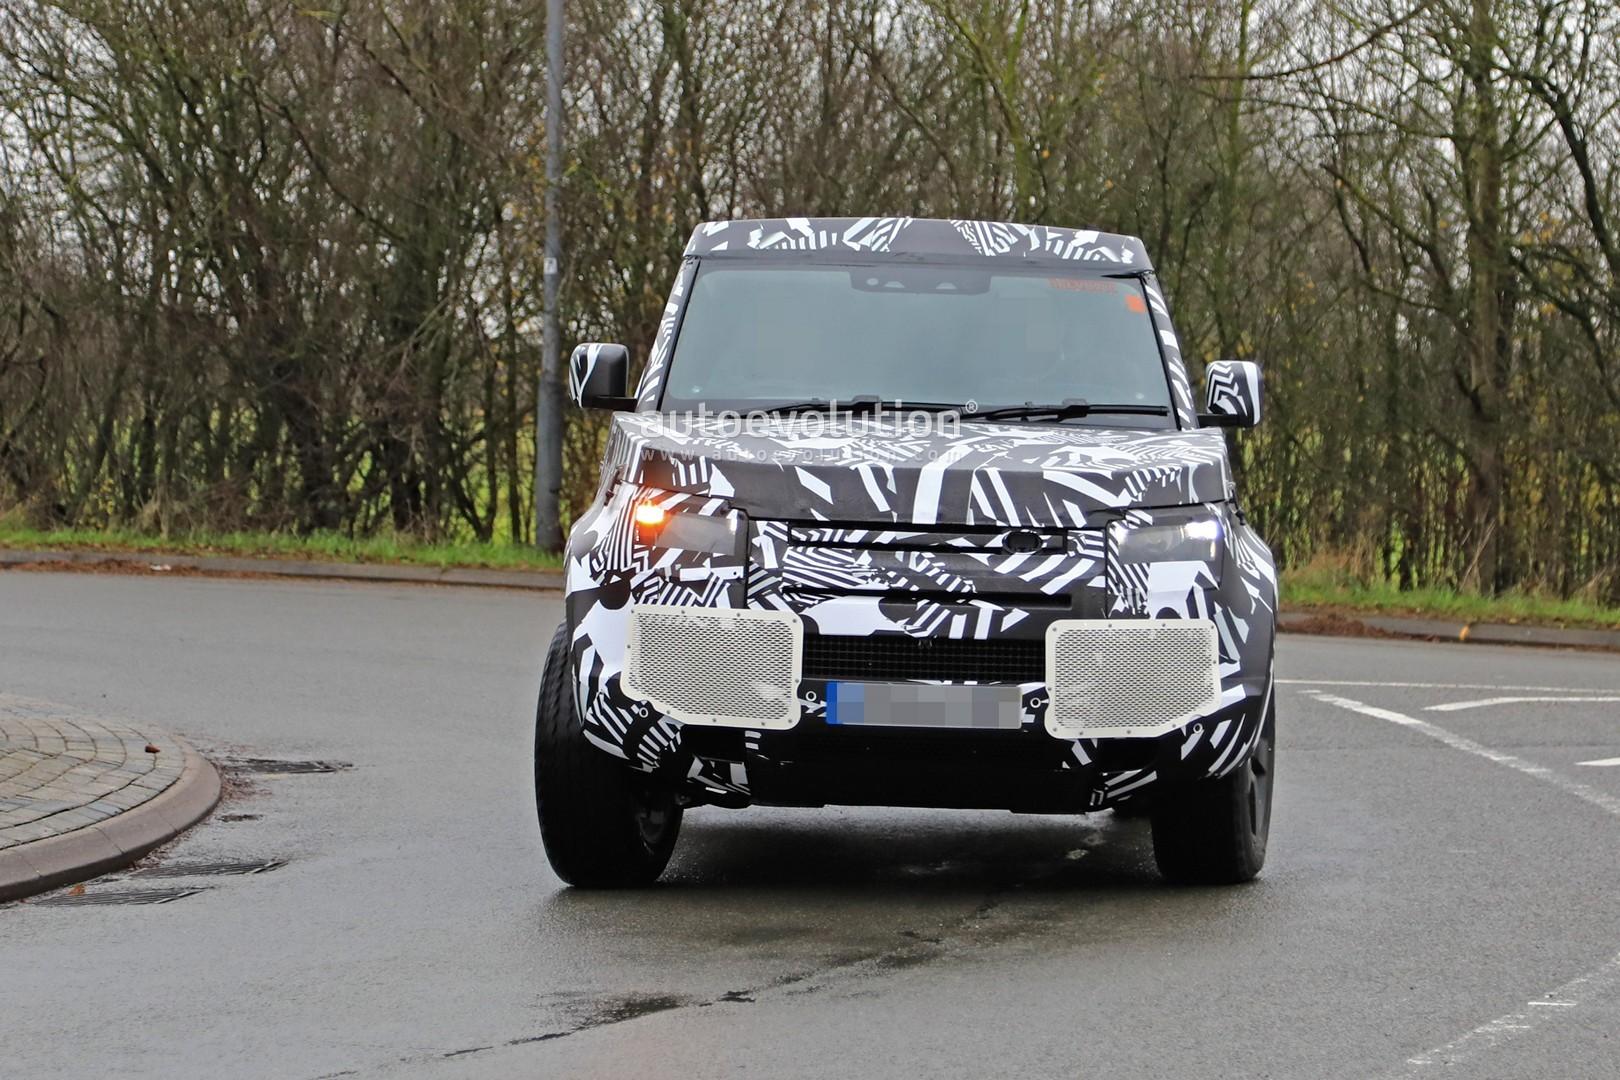 2020 Land Rover Defender 90 Has Short Wheelbase And Three